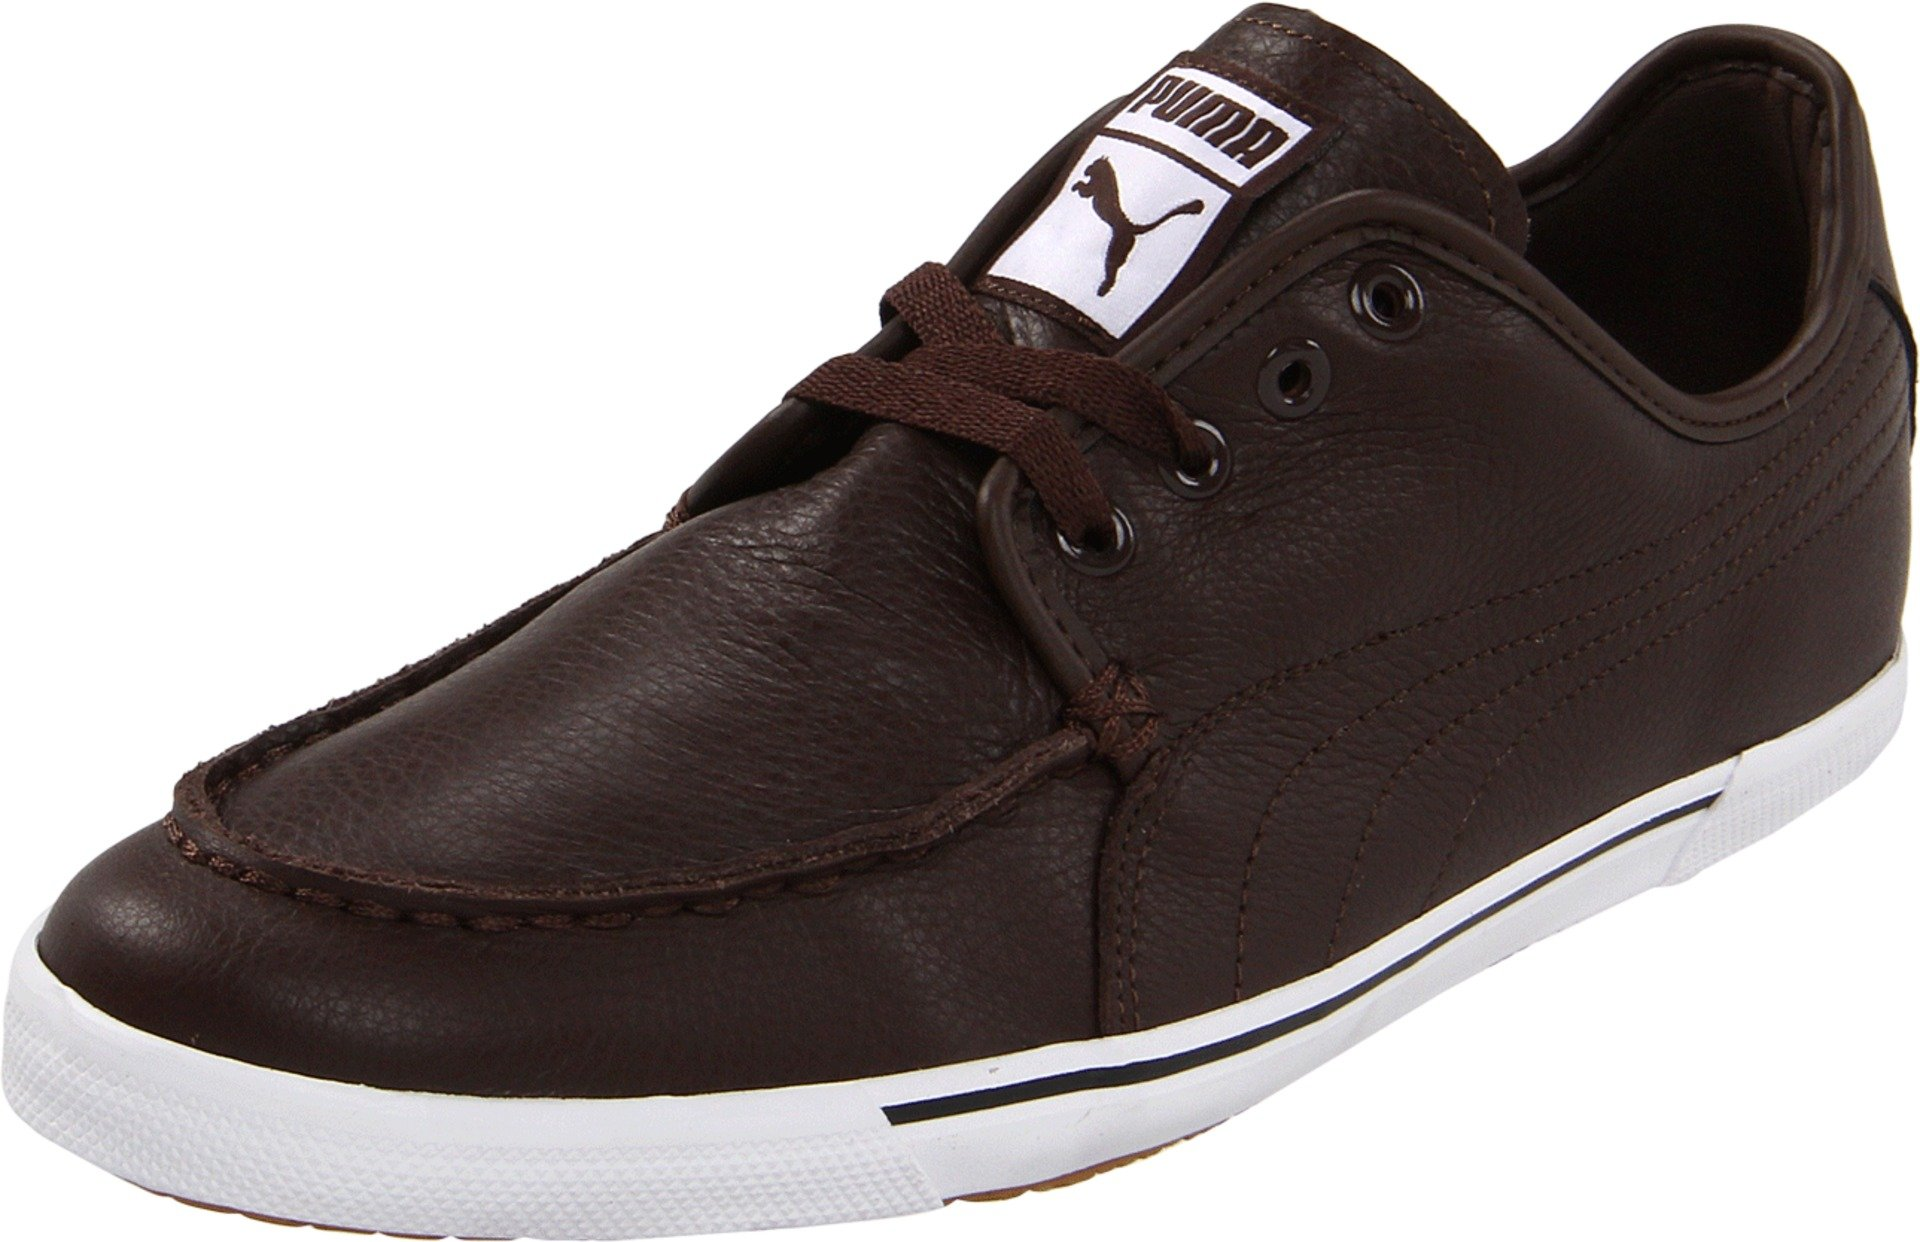 PUMA Benecio Lace-Up Fashion Sneaker,Chocolate Brown,10.5 D US